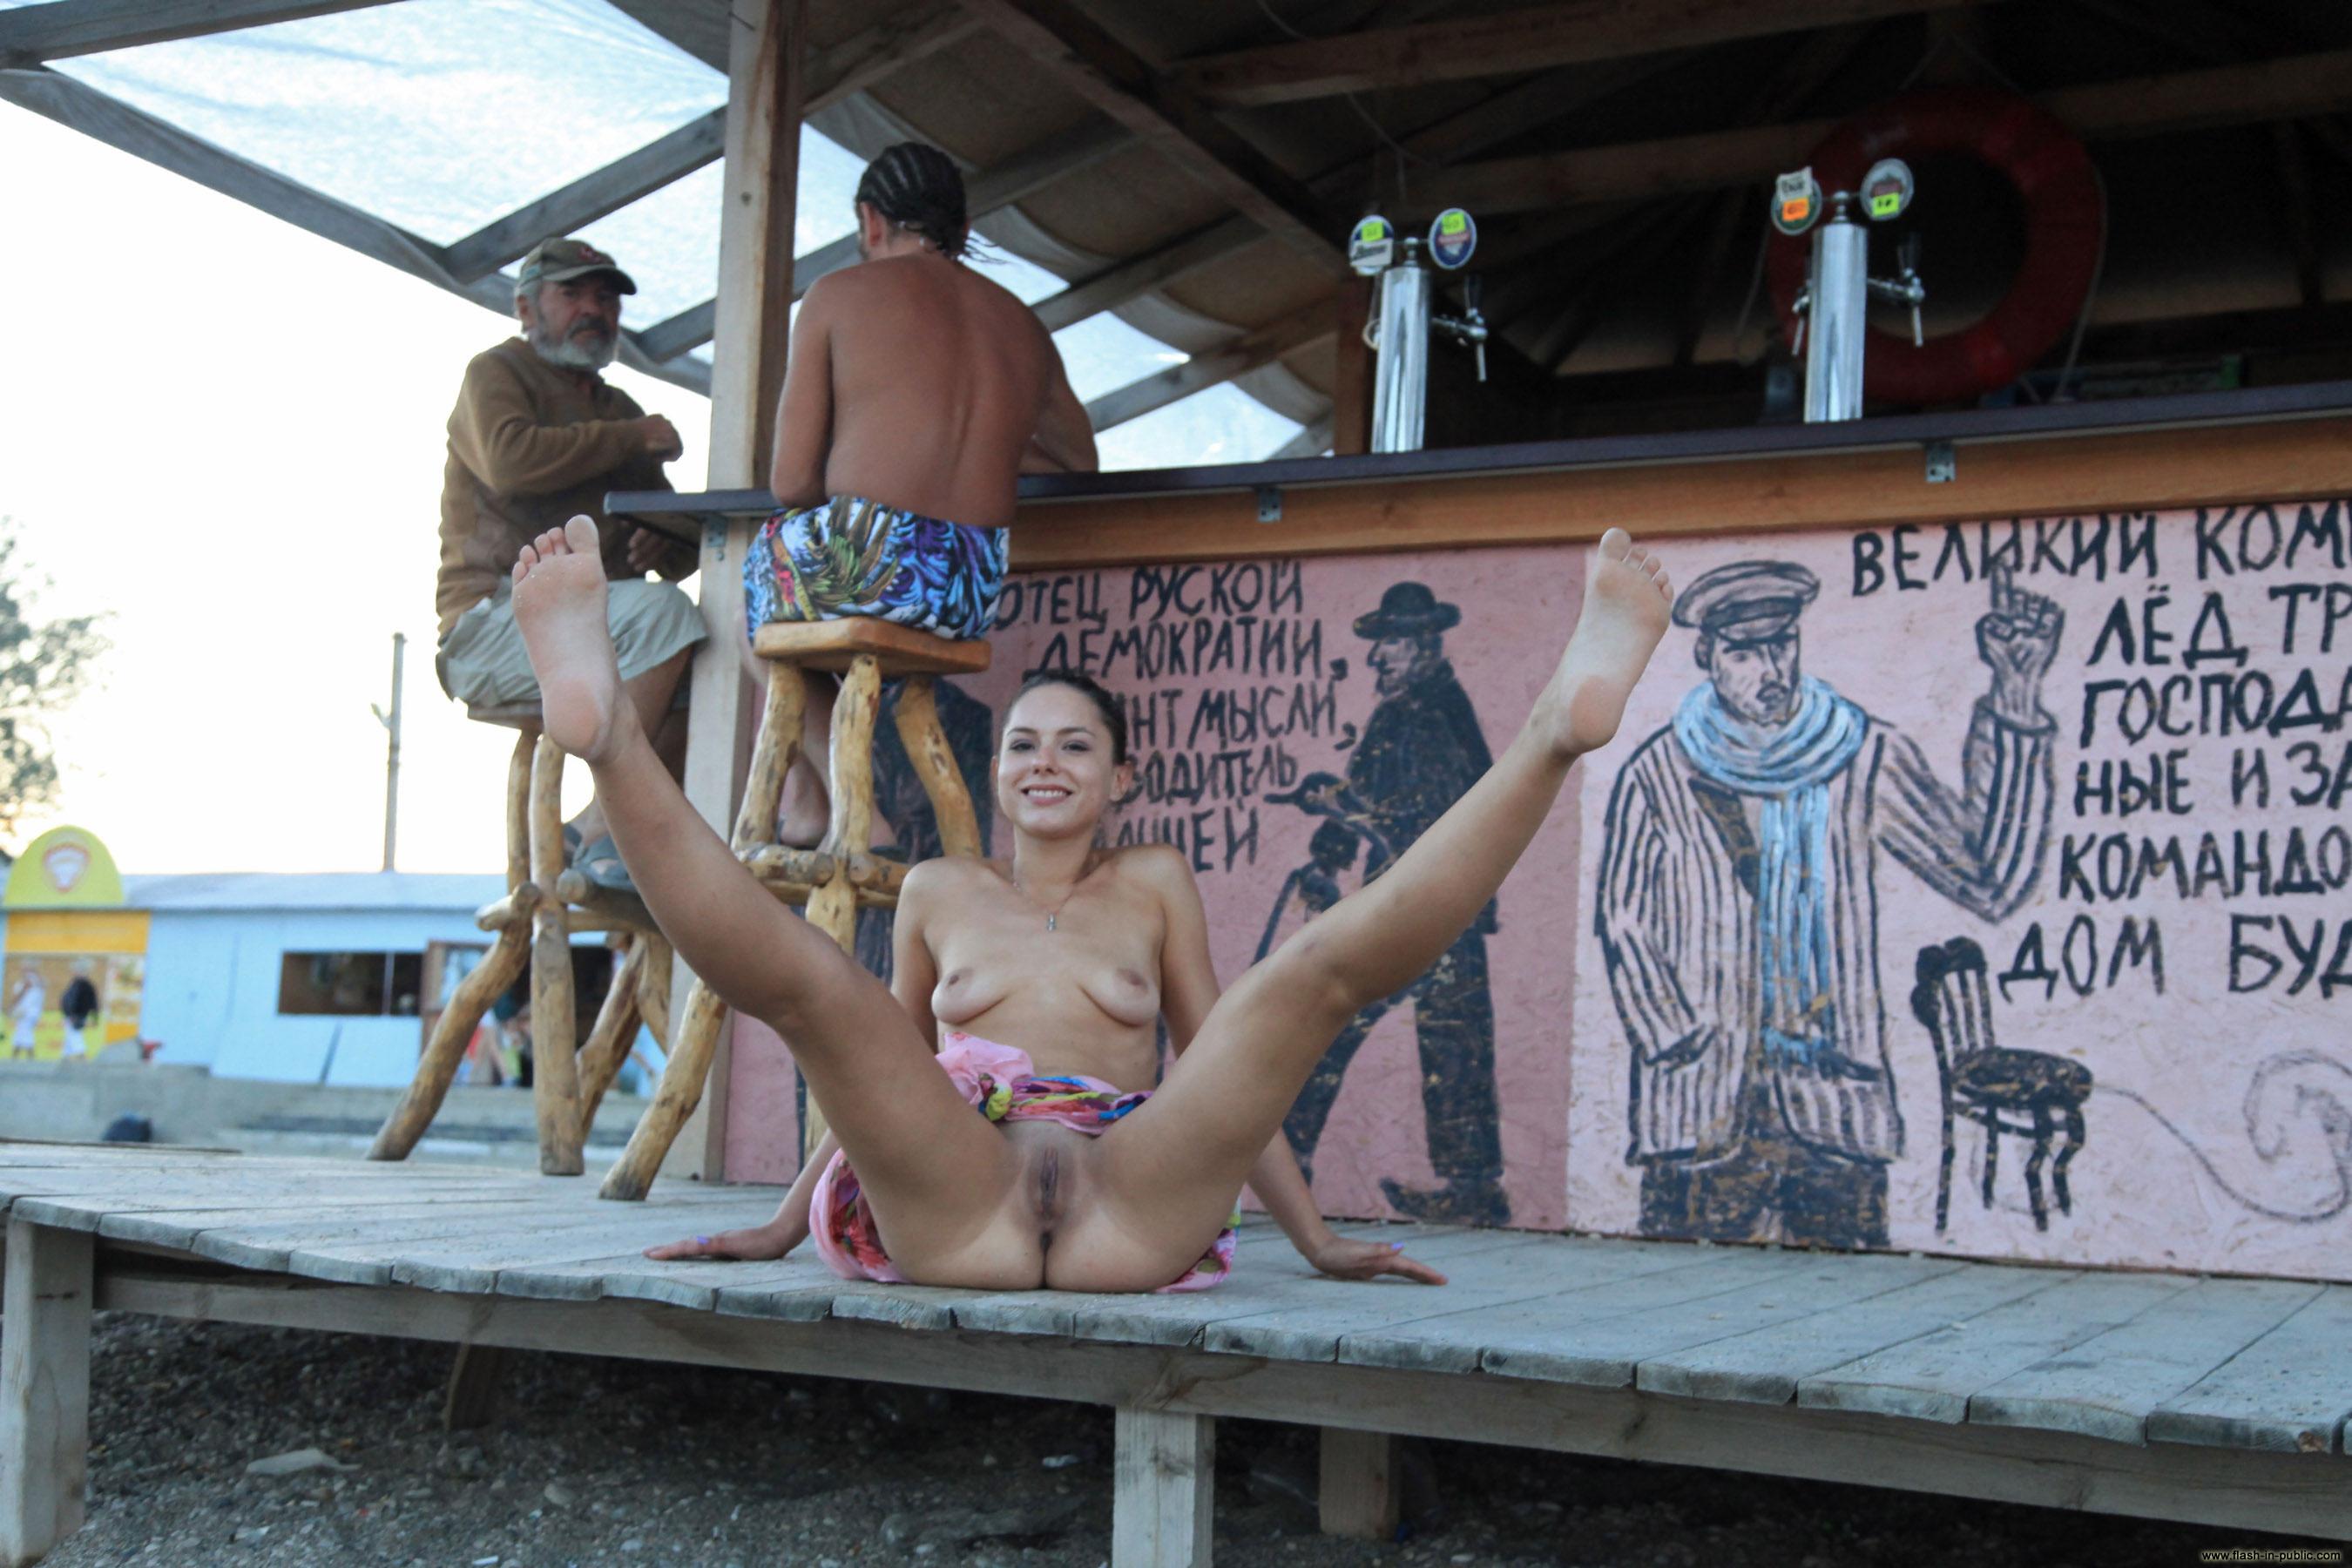 missionary porn babe pics